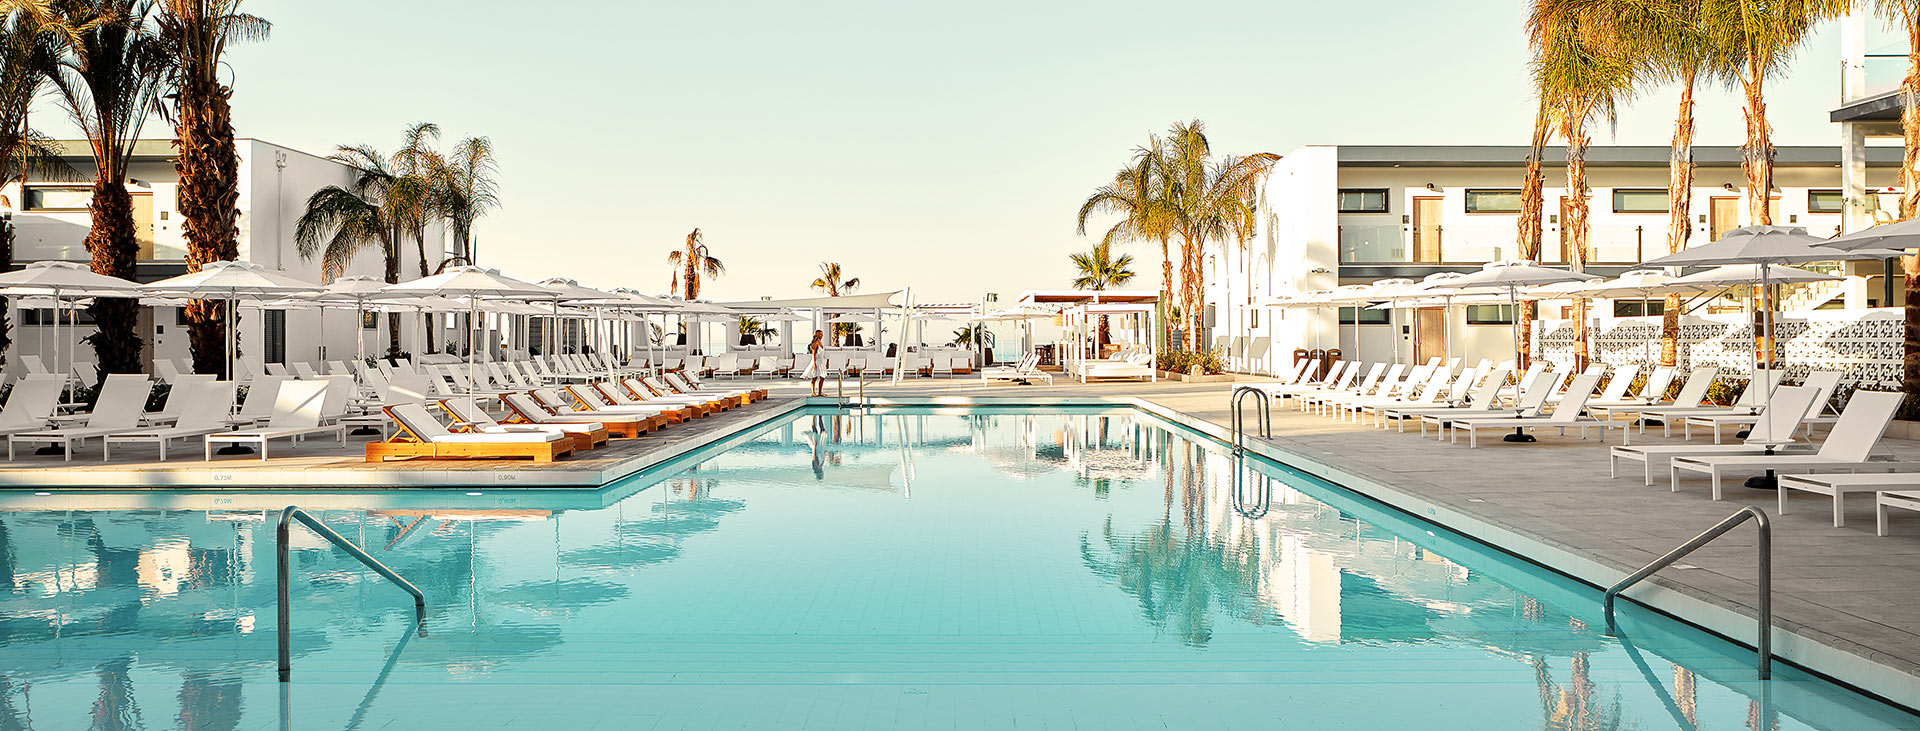 Ocean Beach Club - Kypros, Ayia Napa, Kypros